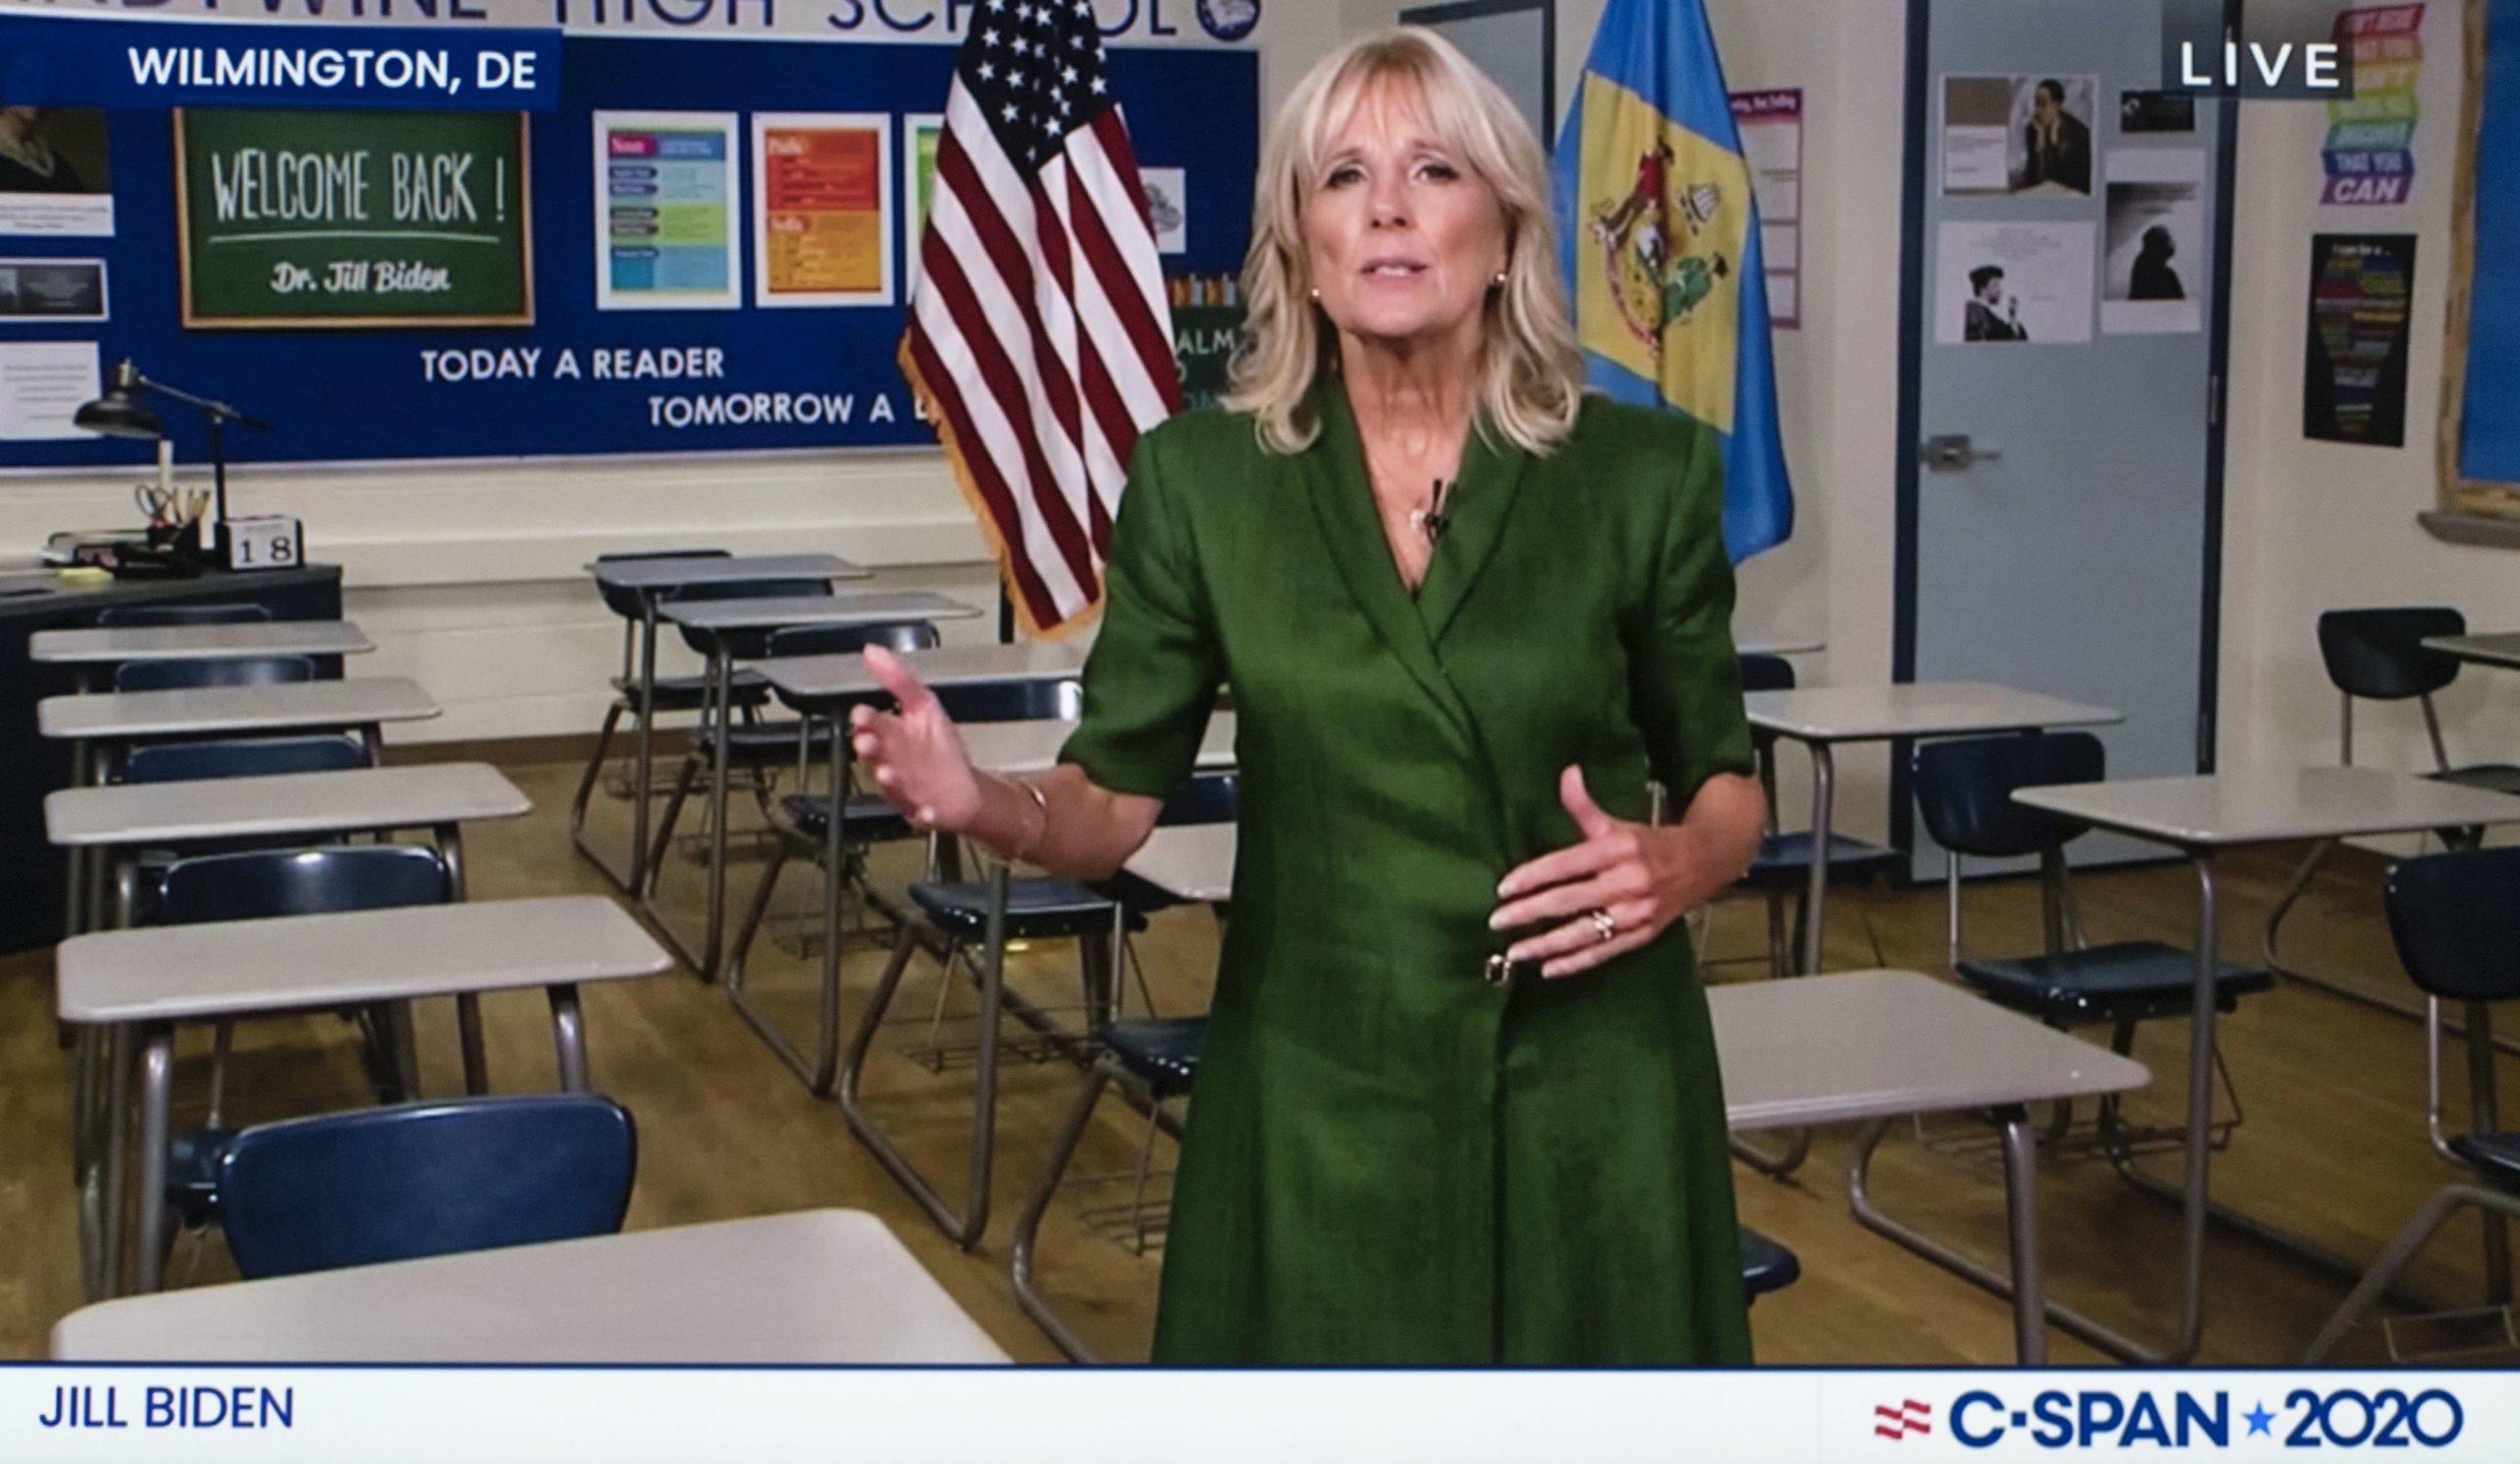 Usa 2020 - democratic convention 2 - Jill Biden